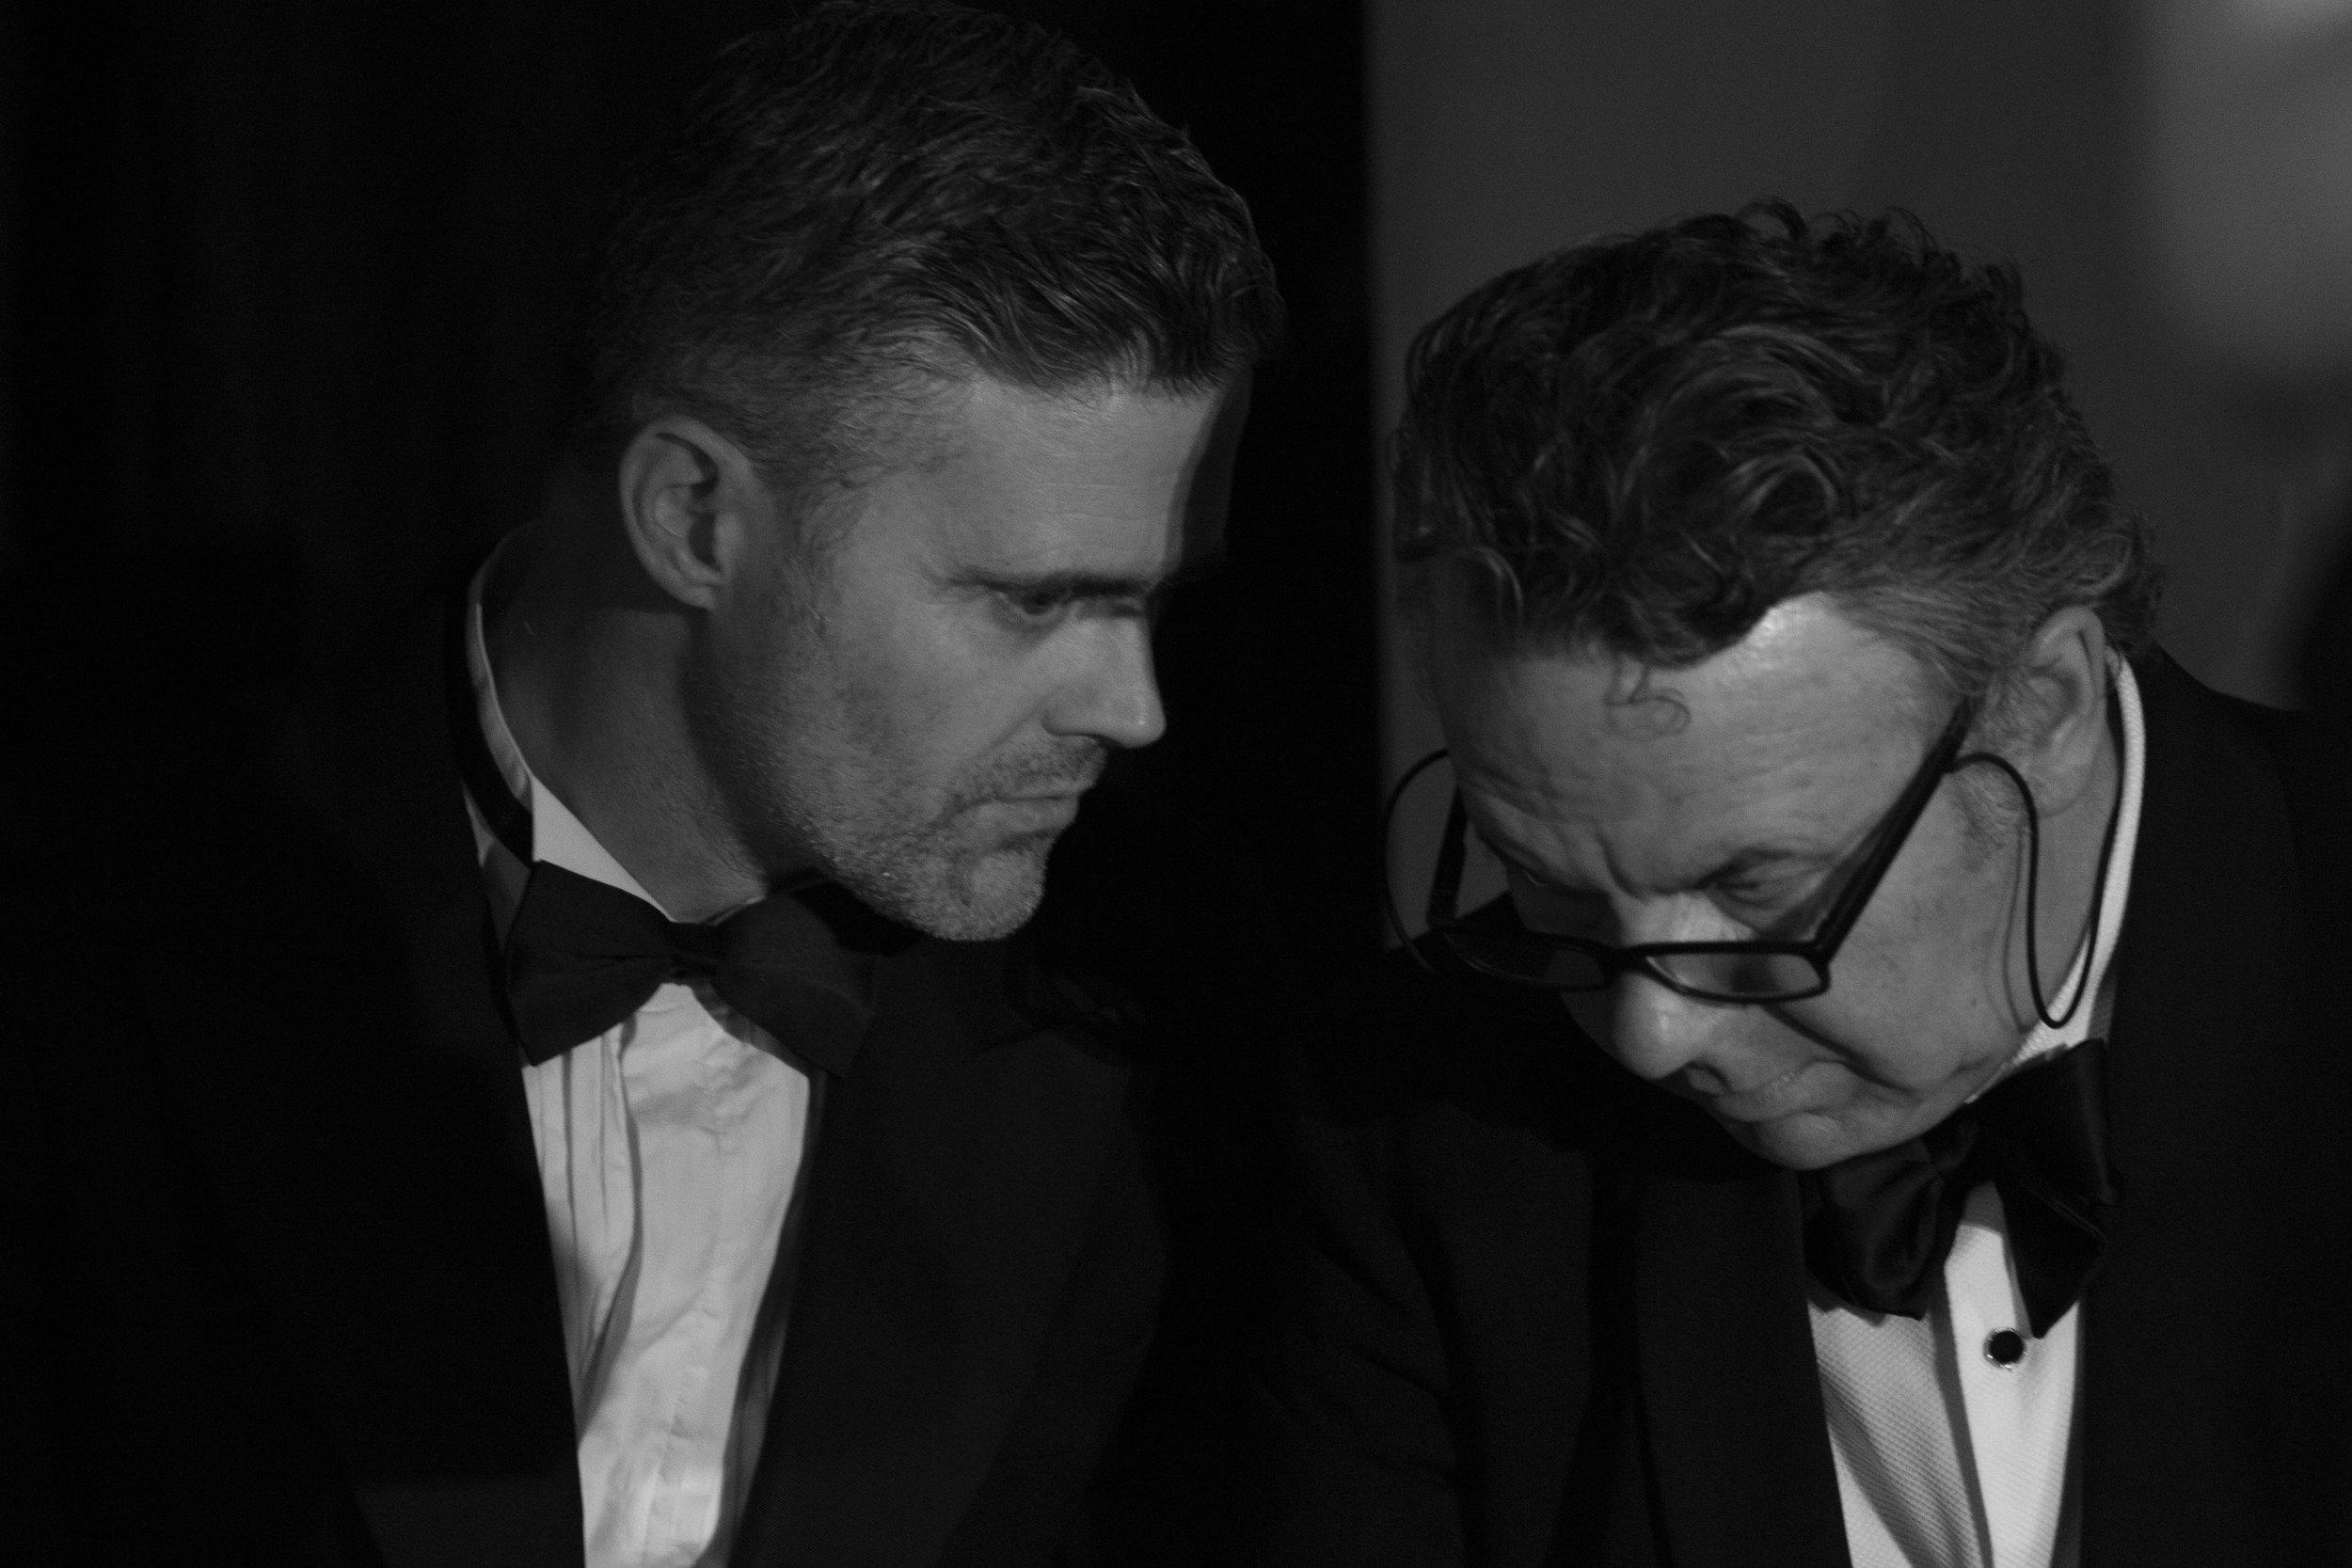 Simon Oats & Michael Veitch